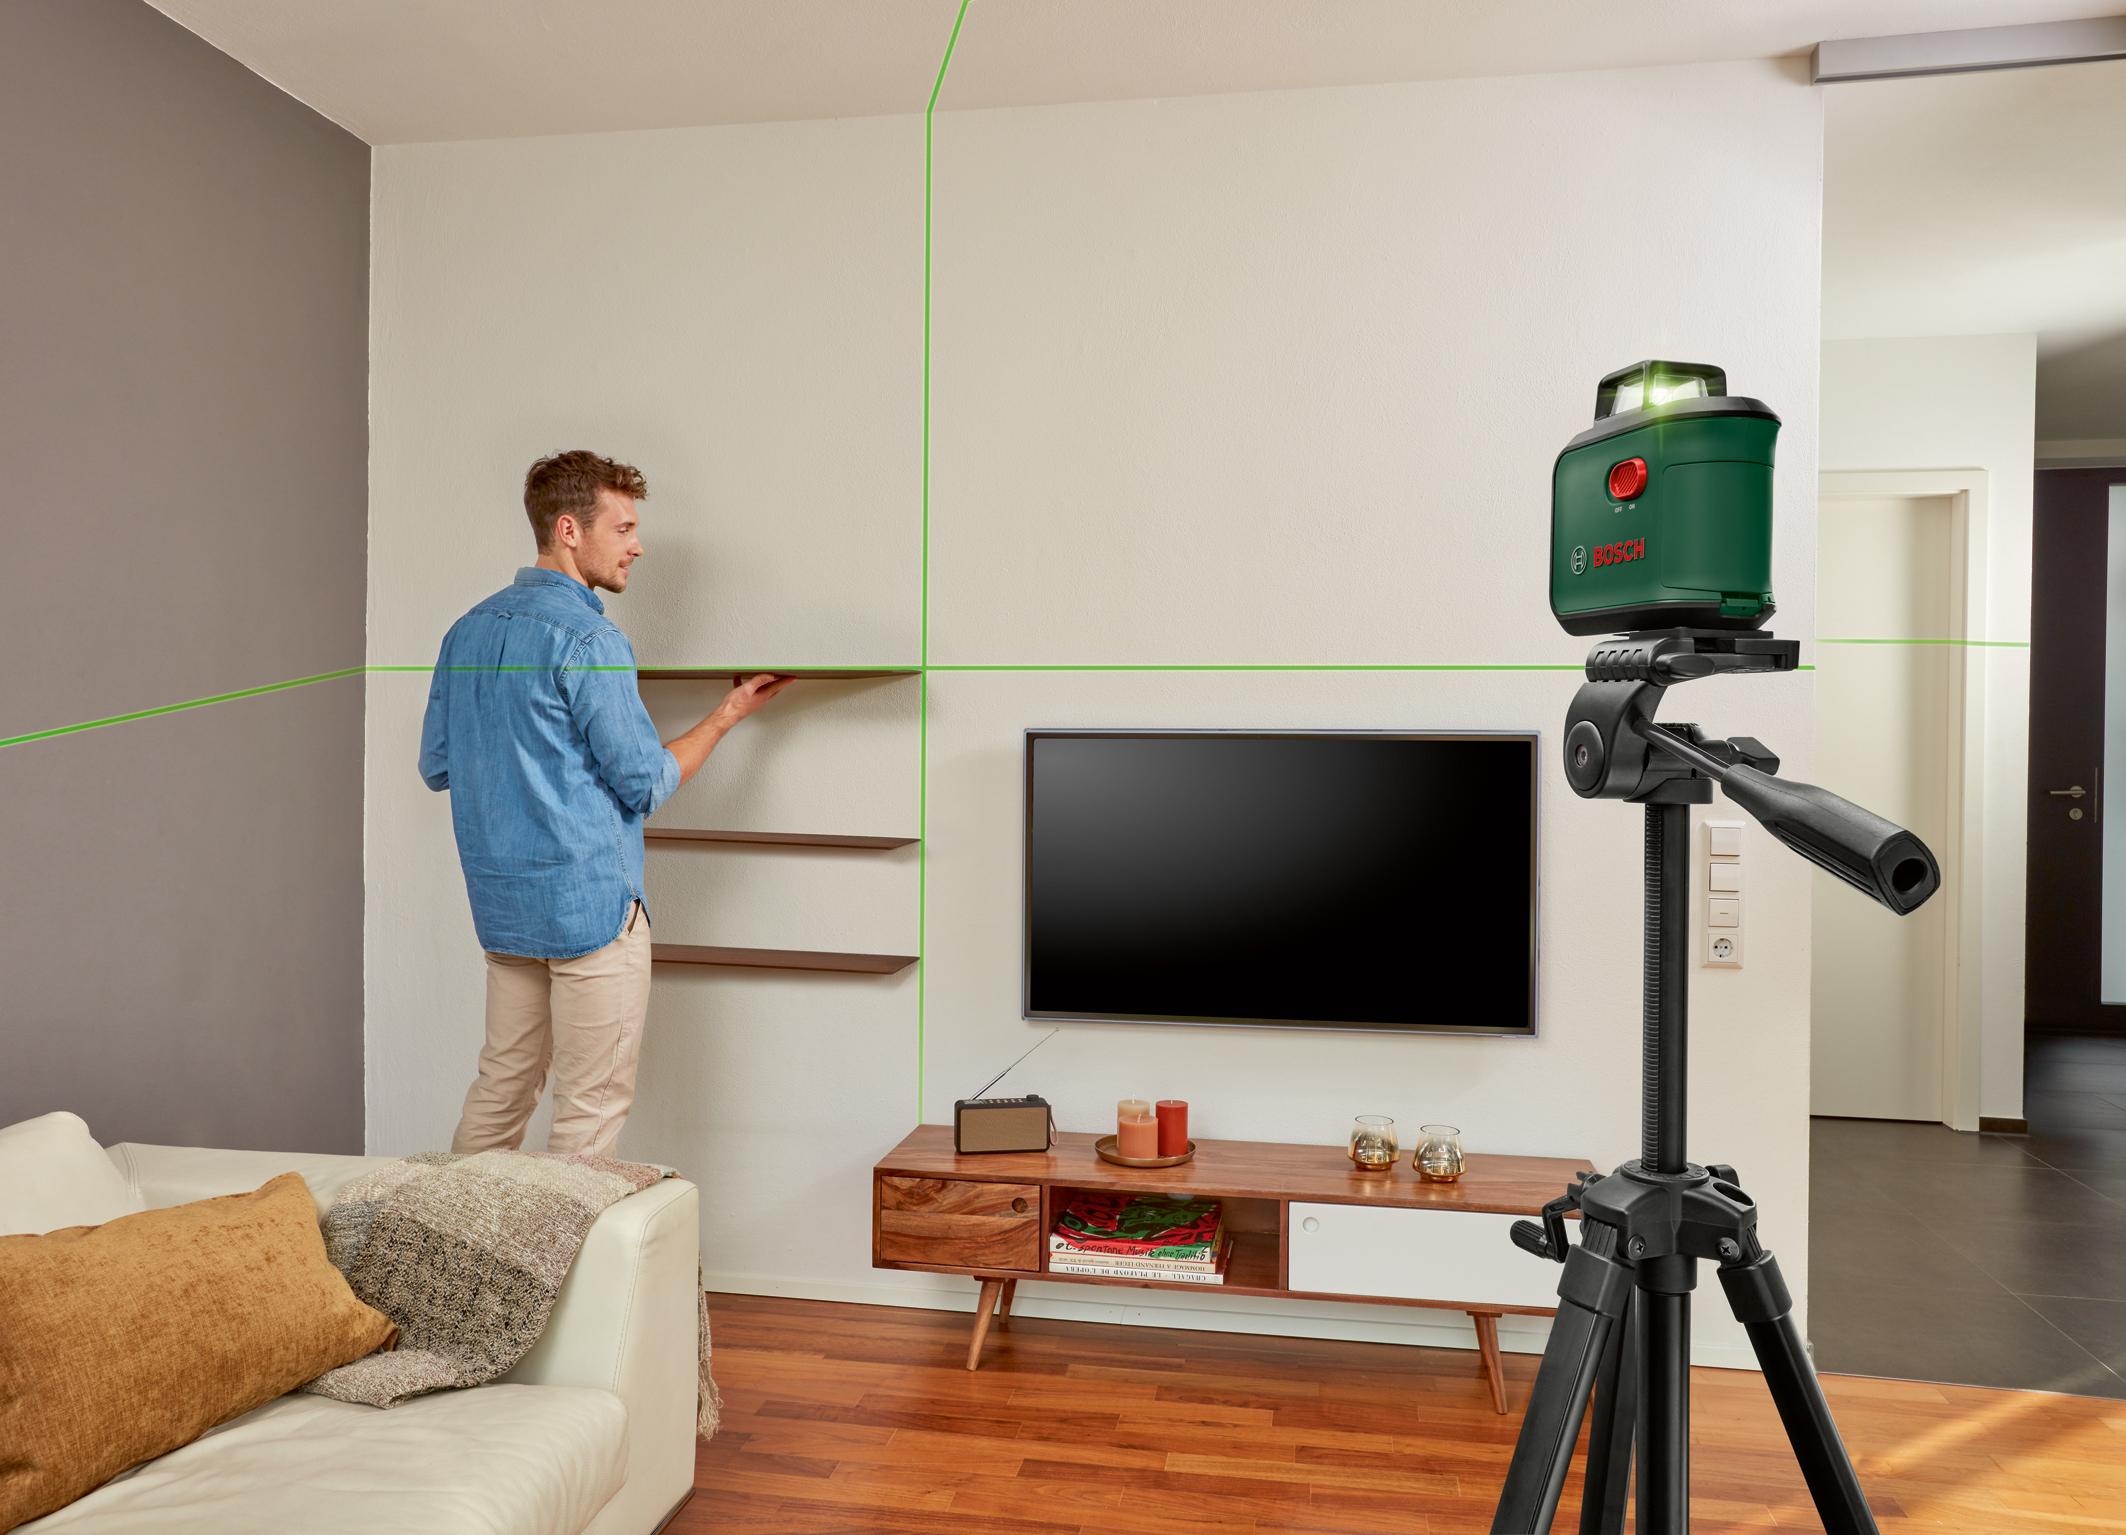 Všestranný pomocník: AdvancedLevel 360 od firmy Bosch pre kutilov